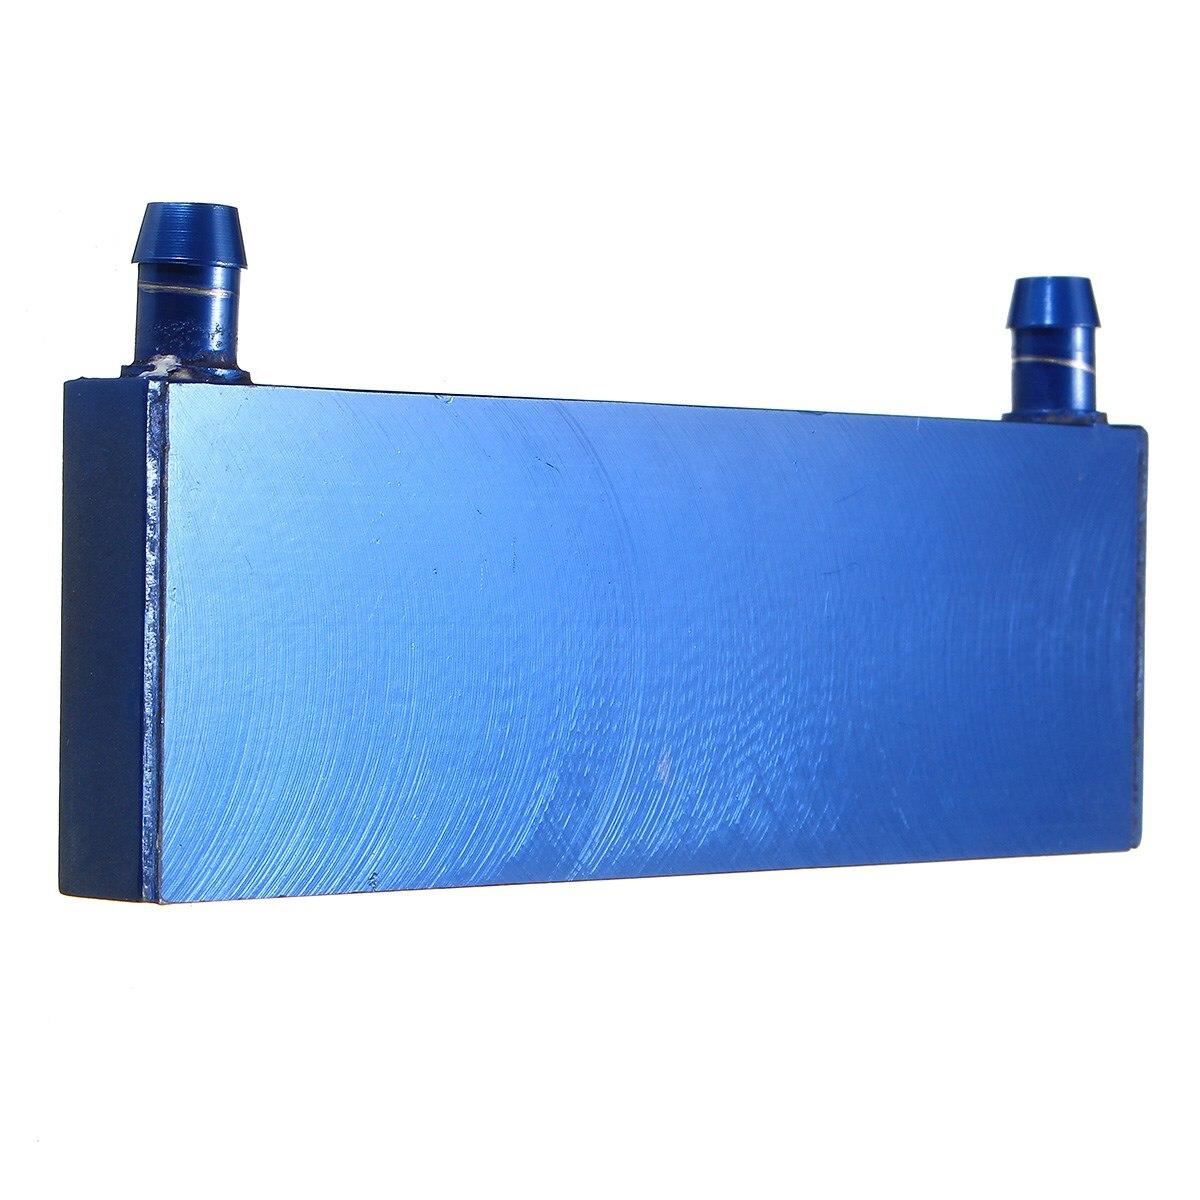 Aluminium Water Cooling Block 122x41x12mm Heatsink Block Liquid Cooler For  CPU GPU Laser Head Industrial Control Cabinet